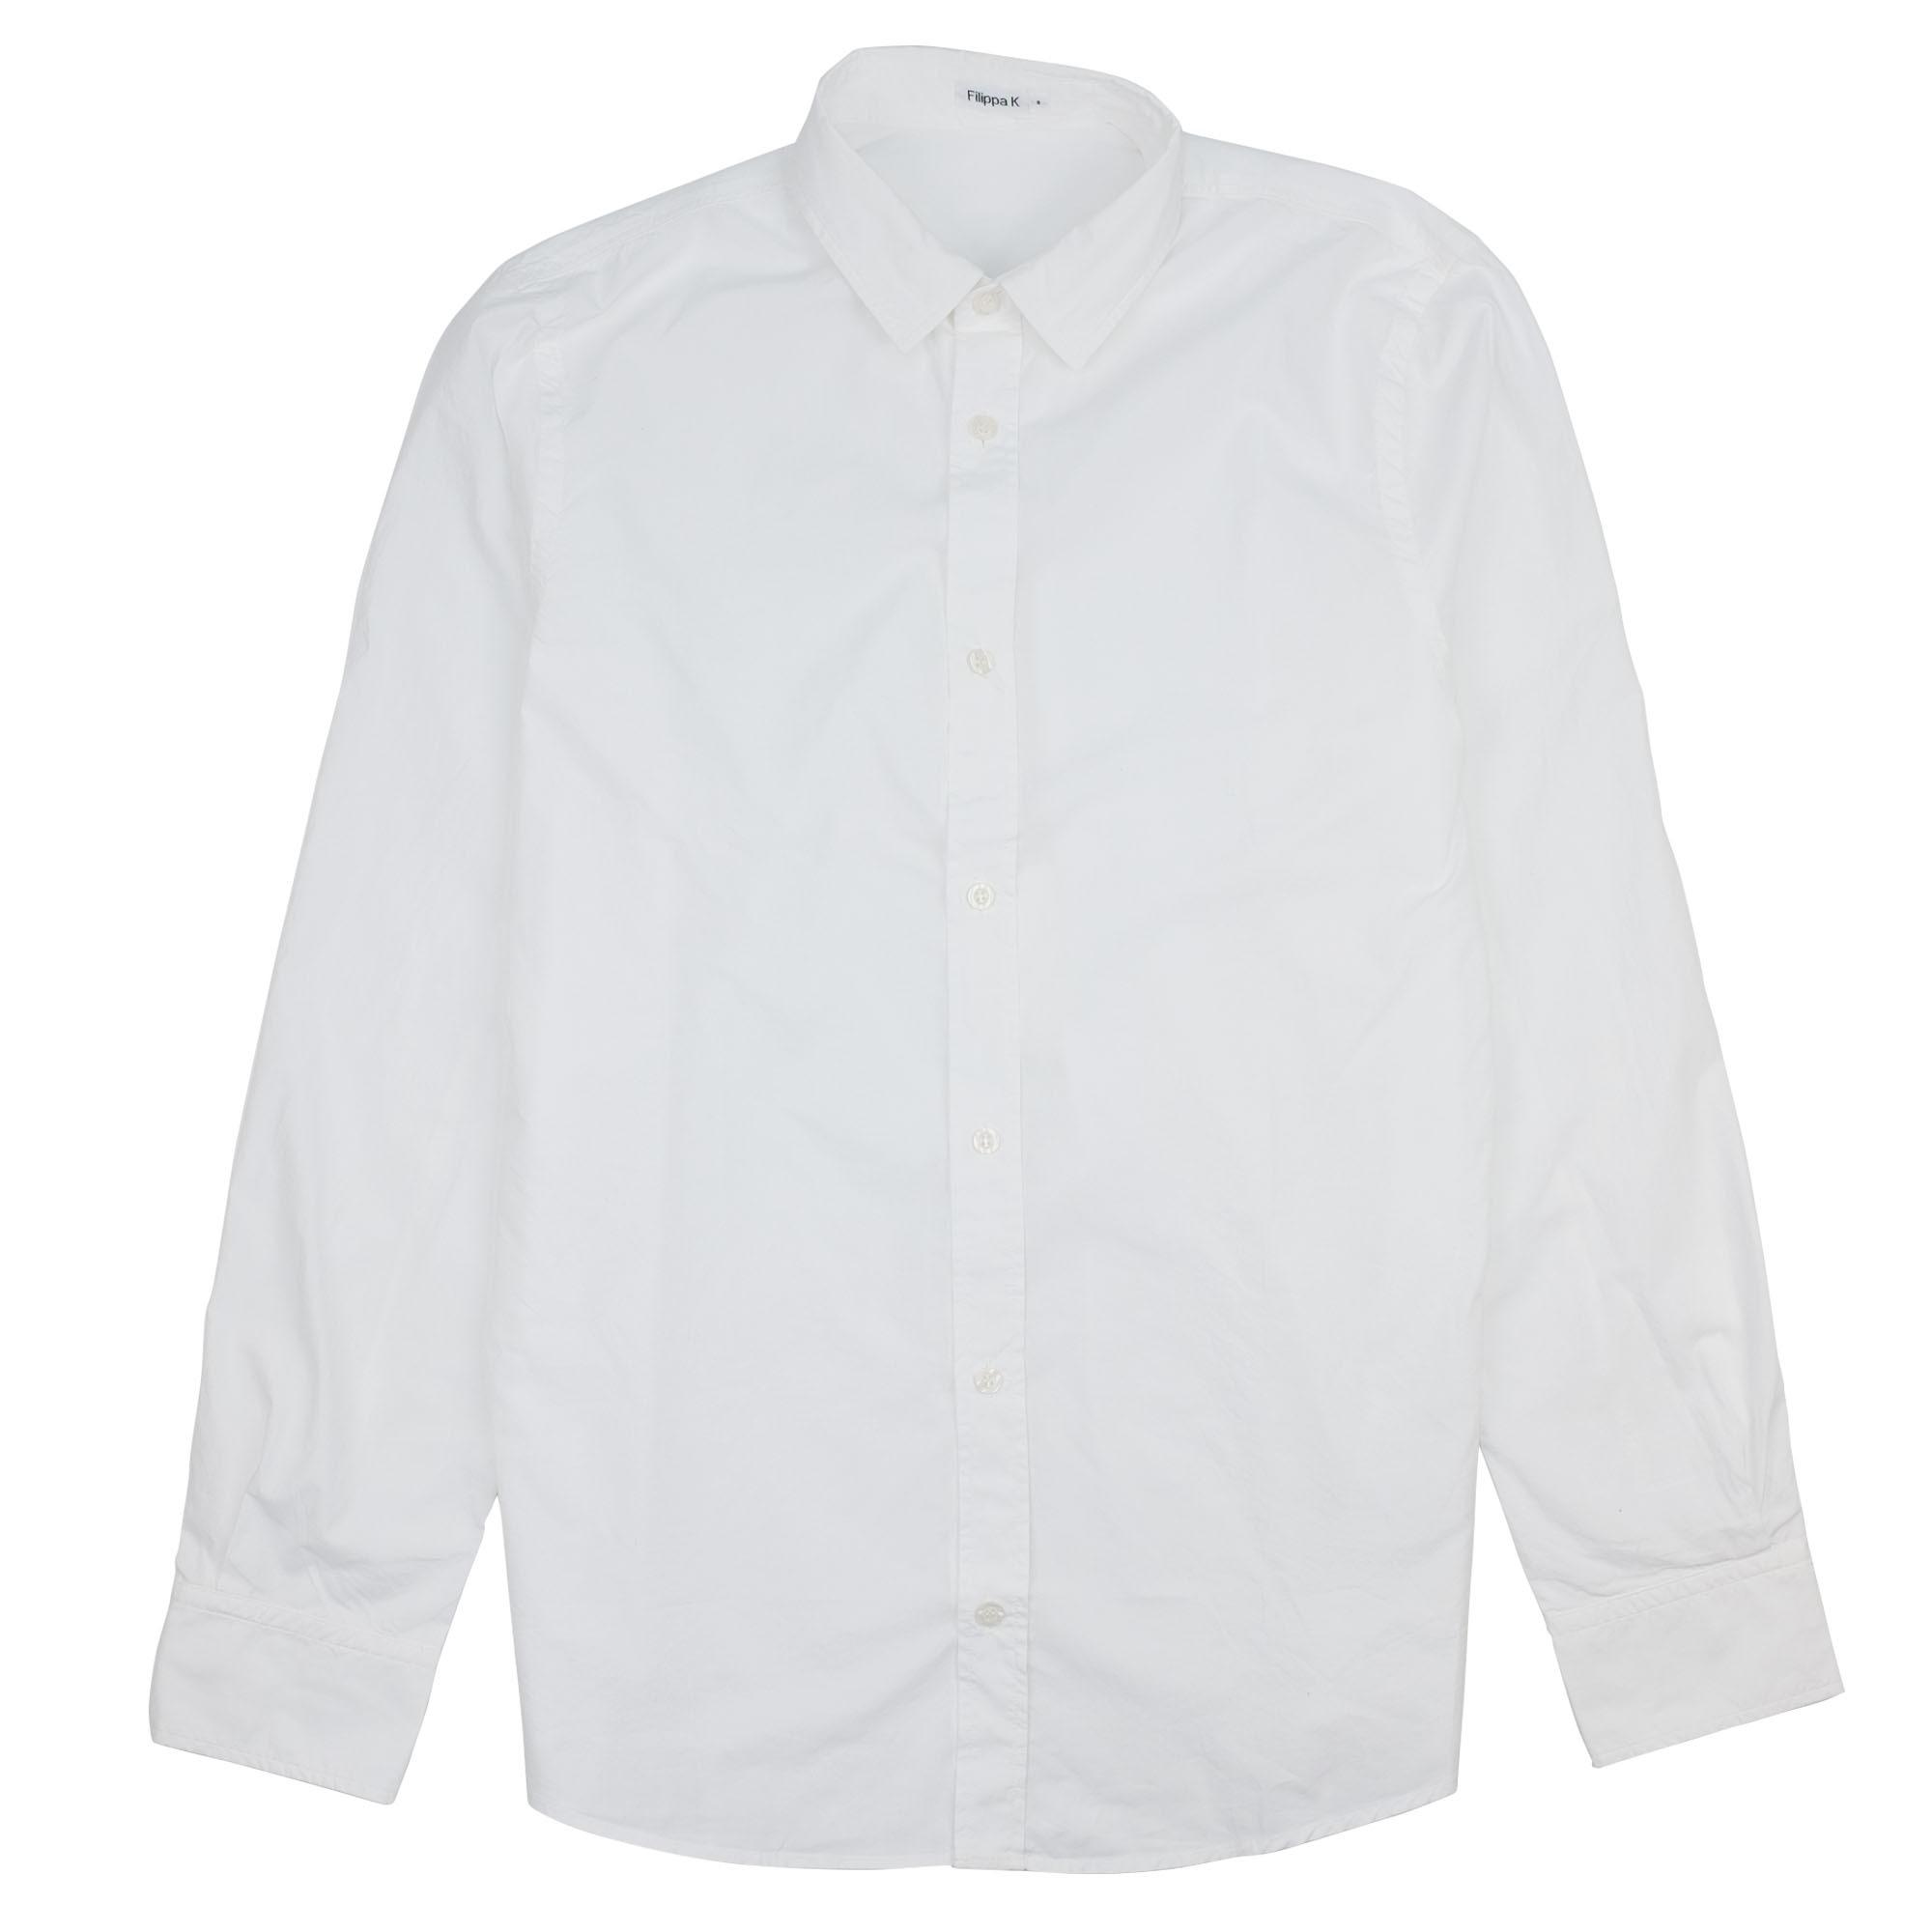 Ben Washed Poplin Shirt White 1